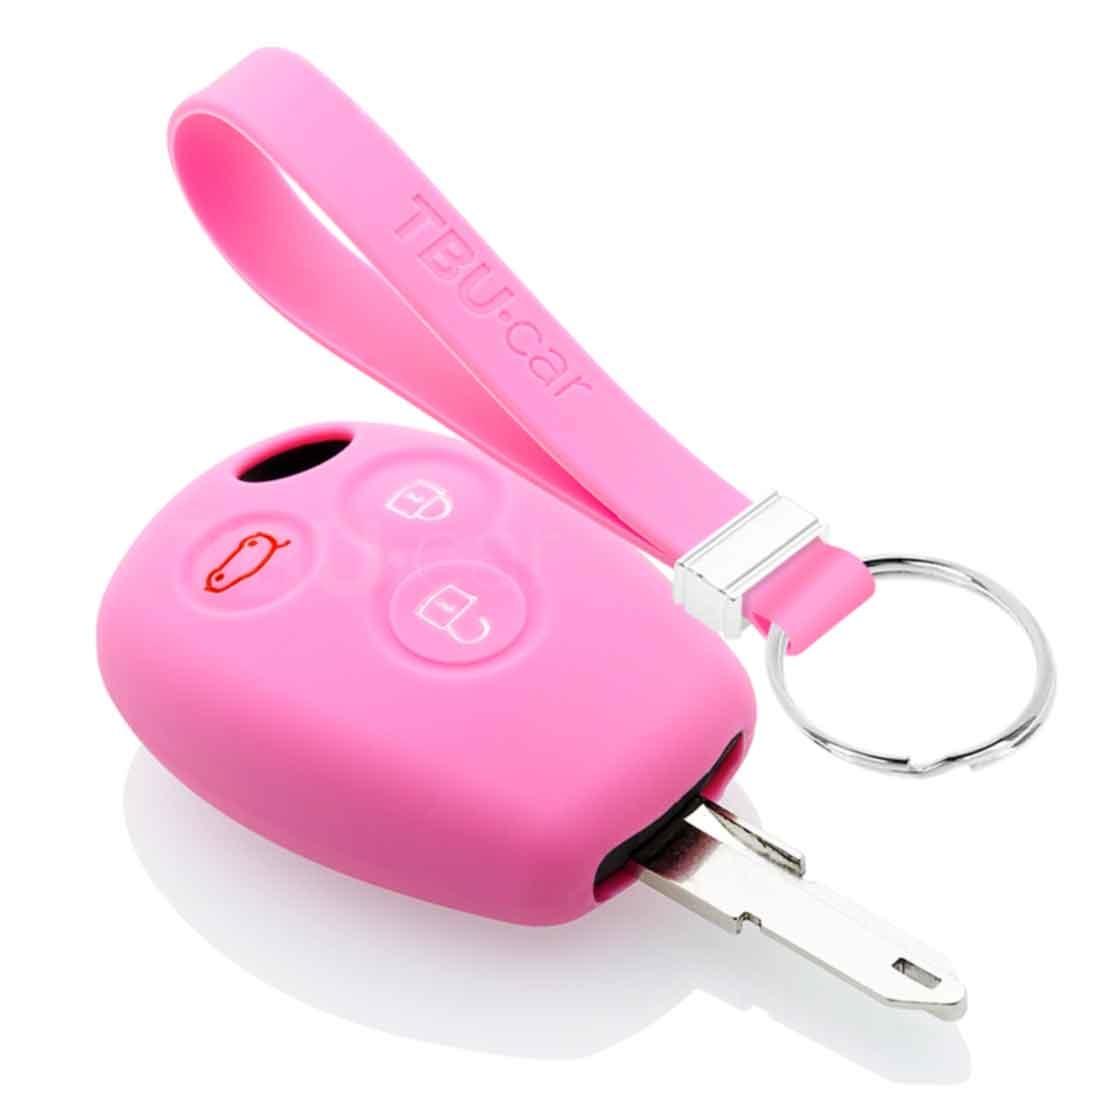 TBU car TBU car Autoschlüssel Hülle kompatibel mit Dacia 3 Tasten - Schutzhülle aus Silikon - Auto Schlüsselhülle Cover in Rosa